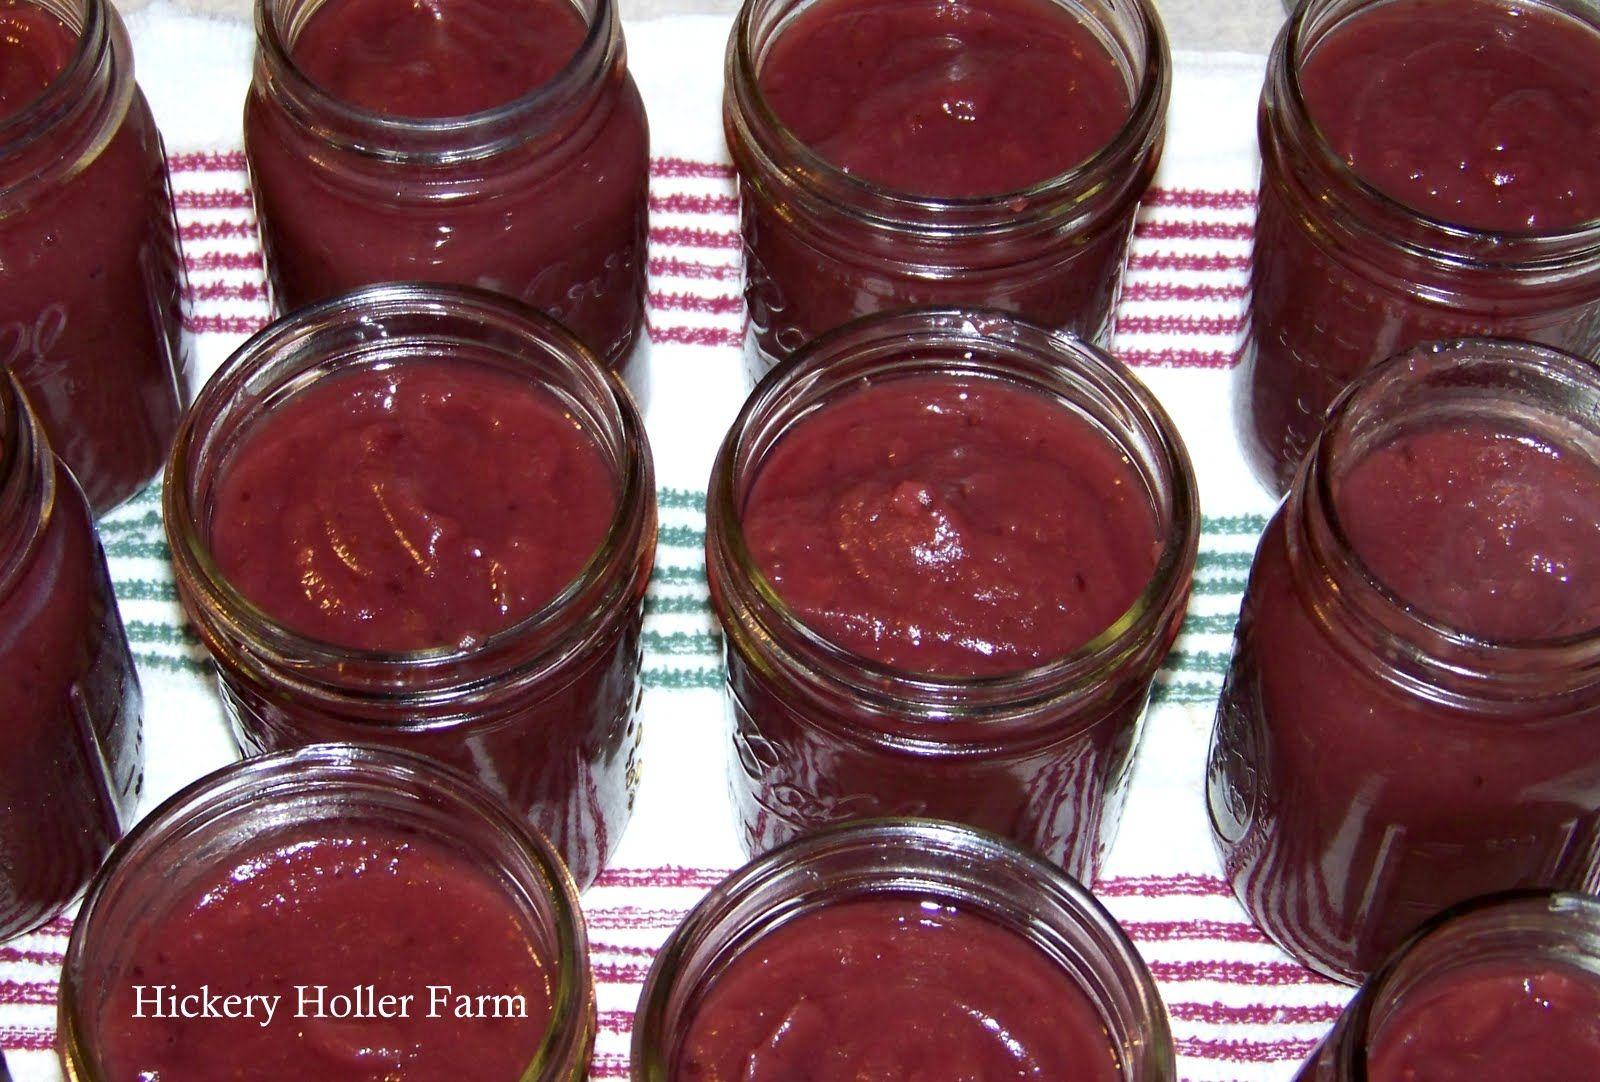 Hickery Holler Farm Apple Blackberry Butter Home